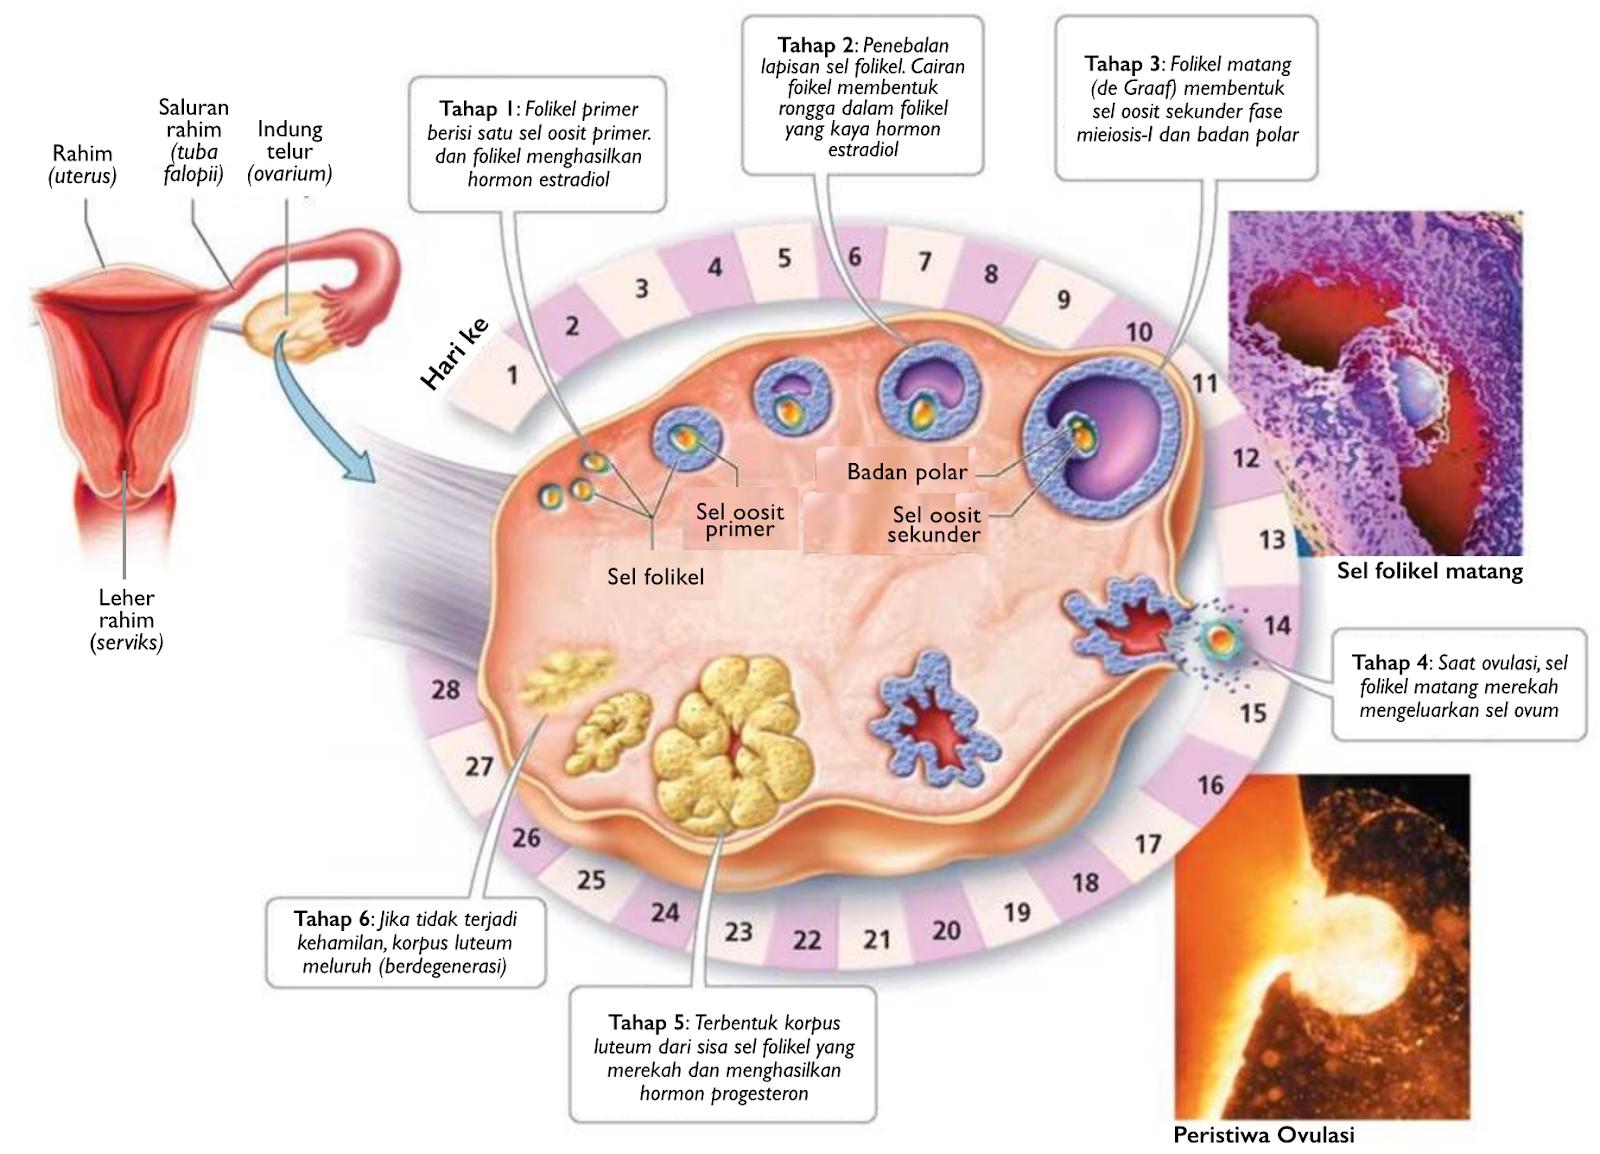 Qnc Jelly Gamat Asli Obat Herbal Polycystic Ovary Syndrome Pcos Berlegalitas Resmi Bpom Ri Tr173301471 Biasanya Diderita Wanita Yang Subur 15 44 Tahun Hampir 70 Dari Semua Memiliki Penyakit Ini Tidak Terdiagnosis Dalam Jangka Lama Dapat